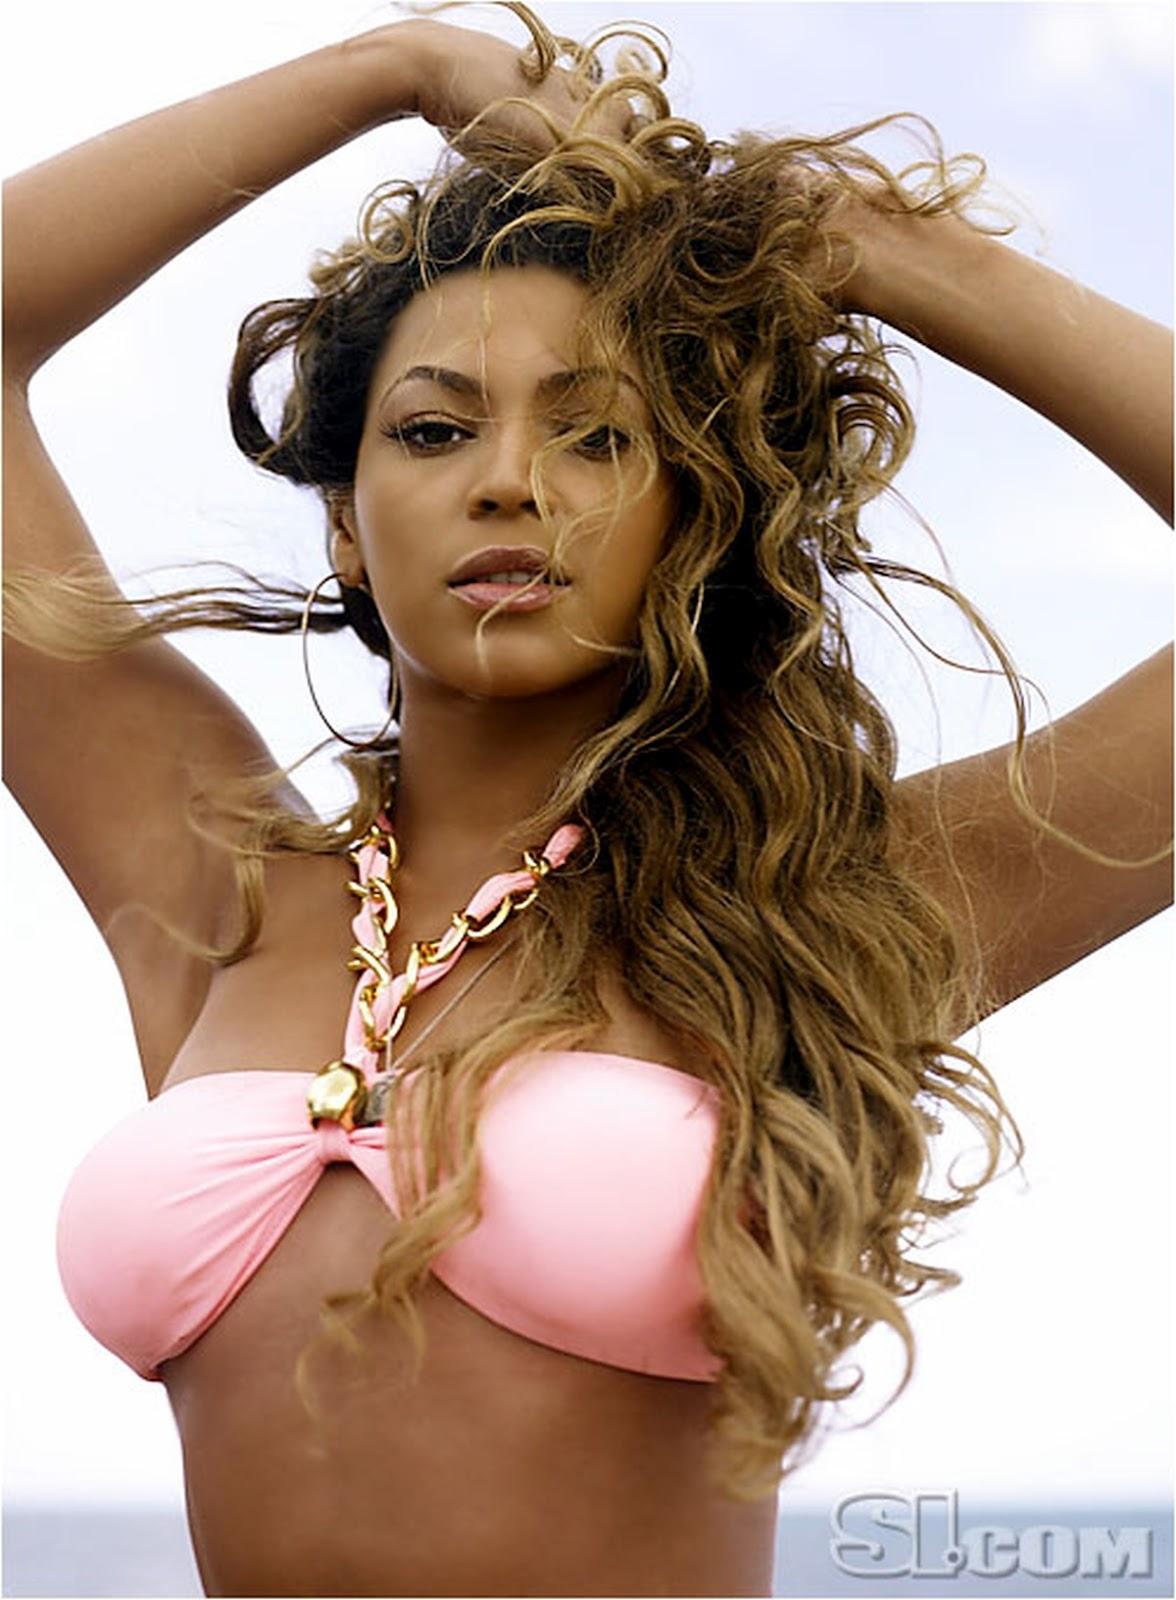 http://4.bp.blogspot.com/-BNe-sfrxVh8/T37qatRmeGI/AAAAAAAABbQ/UURTOGwEaXY/s1600/Sexy_Beyonce_Bikini_HQ_Wallpapers_Pack_1-4.jpg_Picture_-_7.jpg